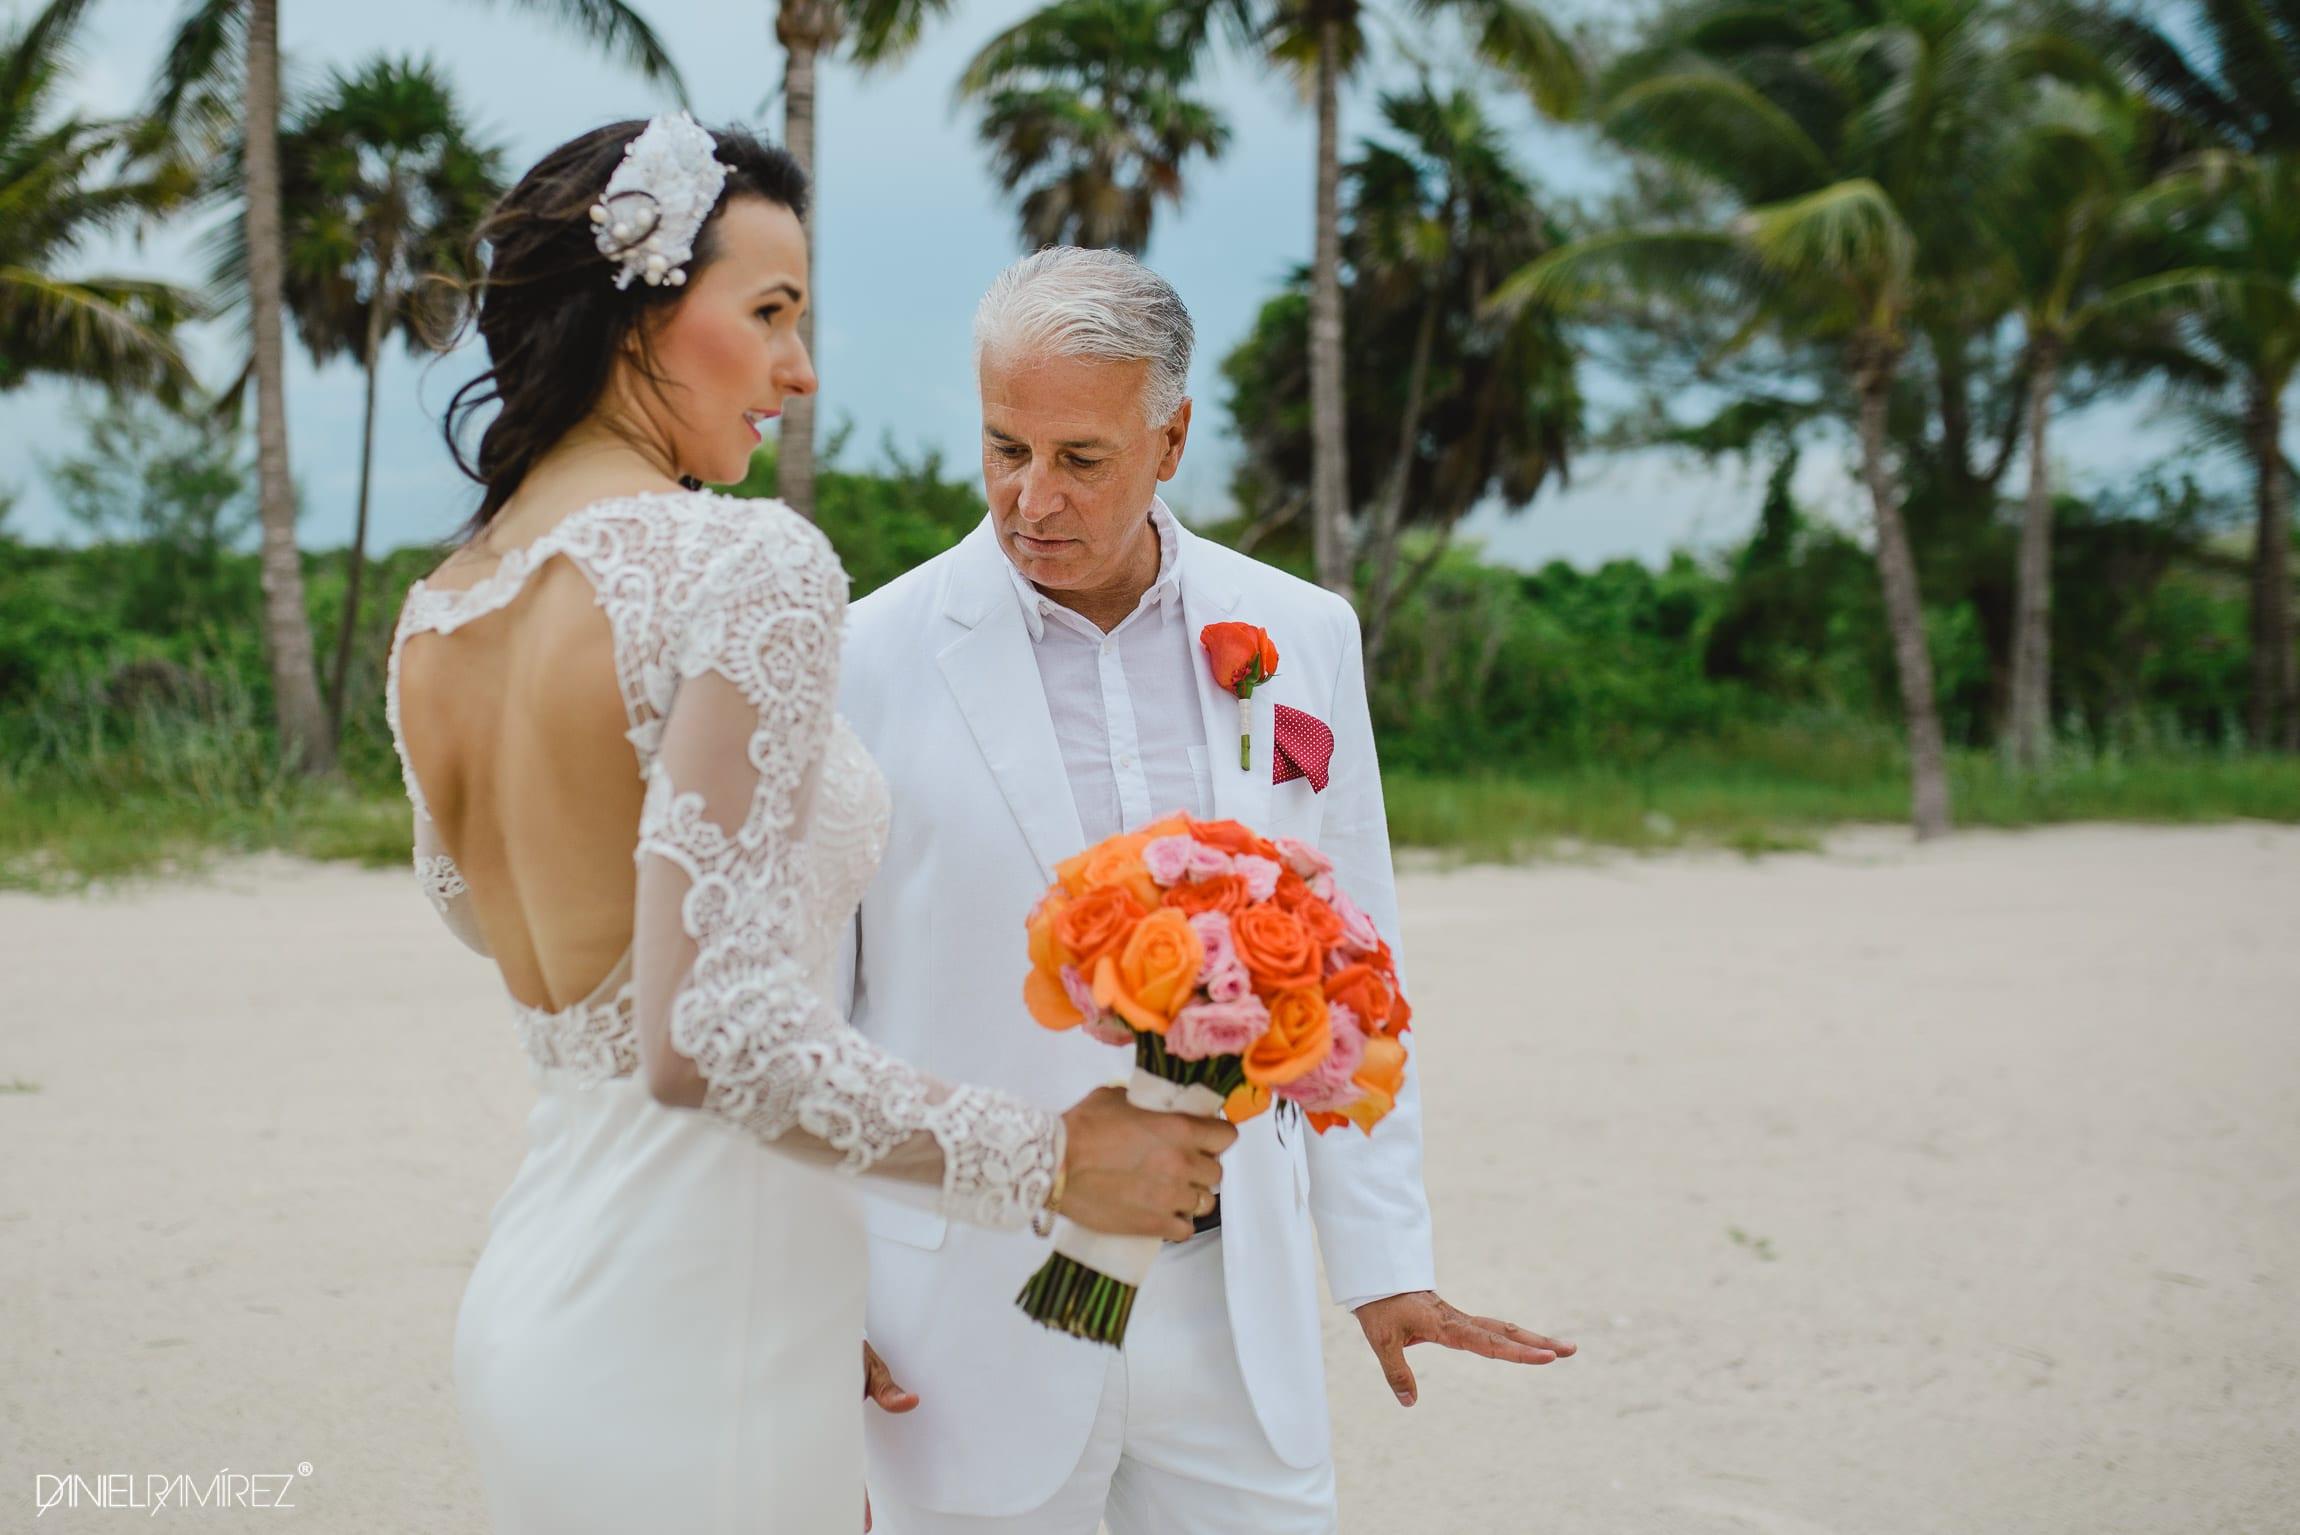 best bride dress ever